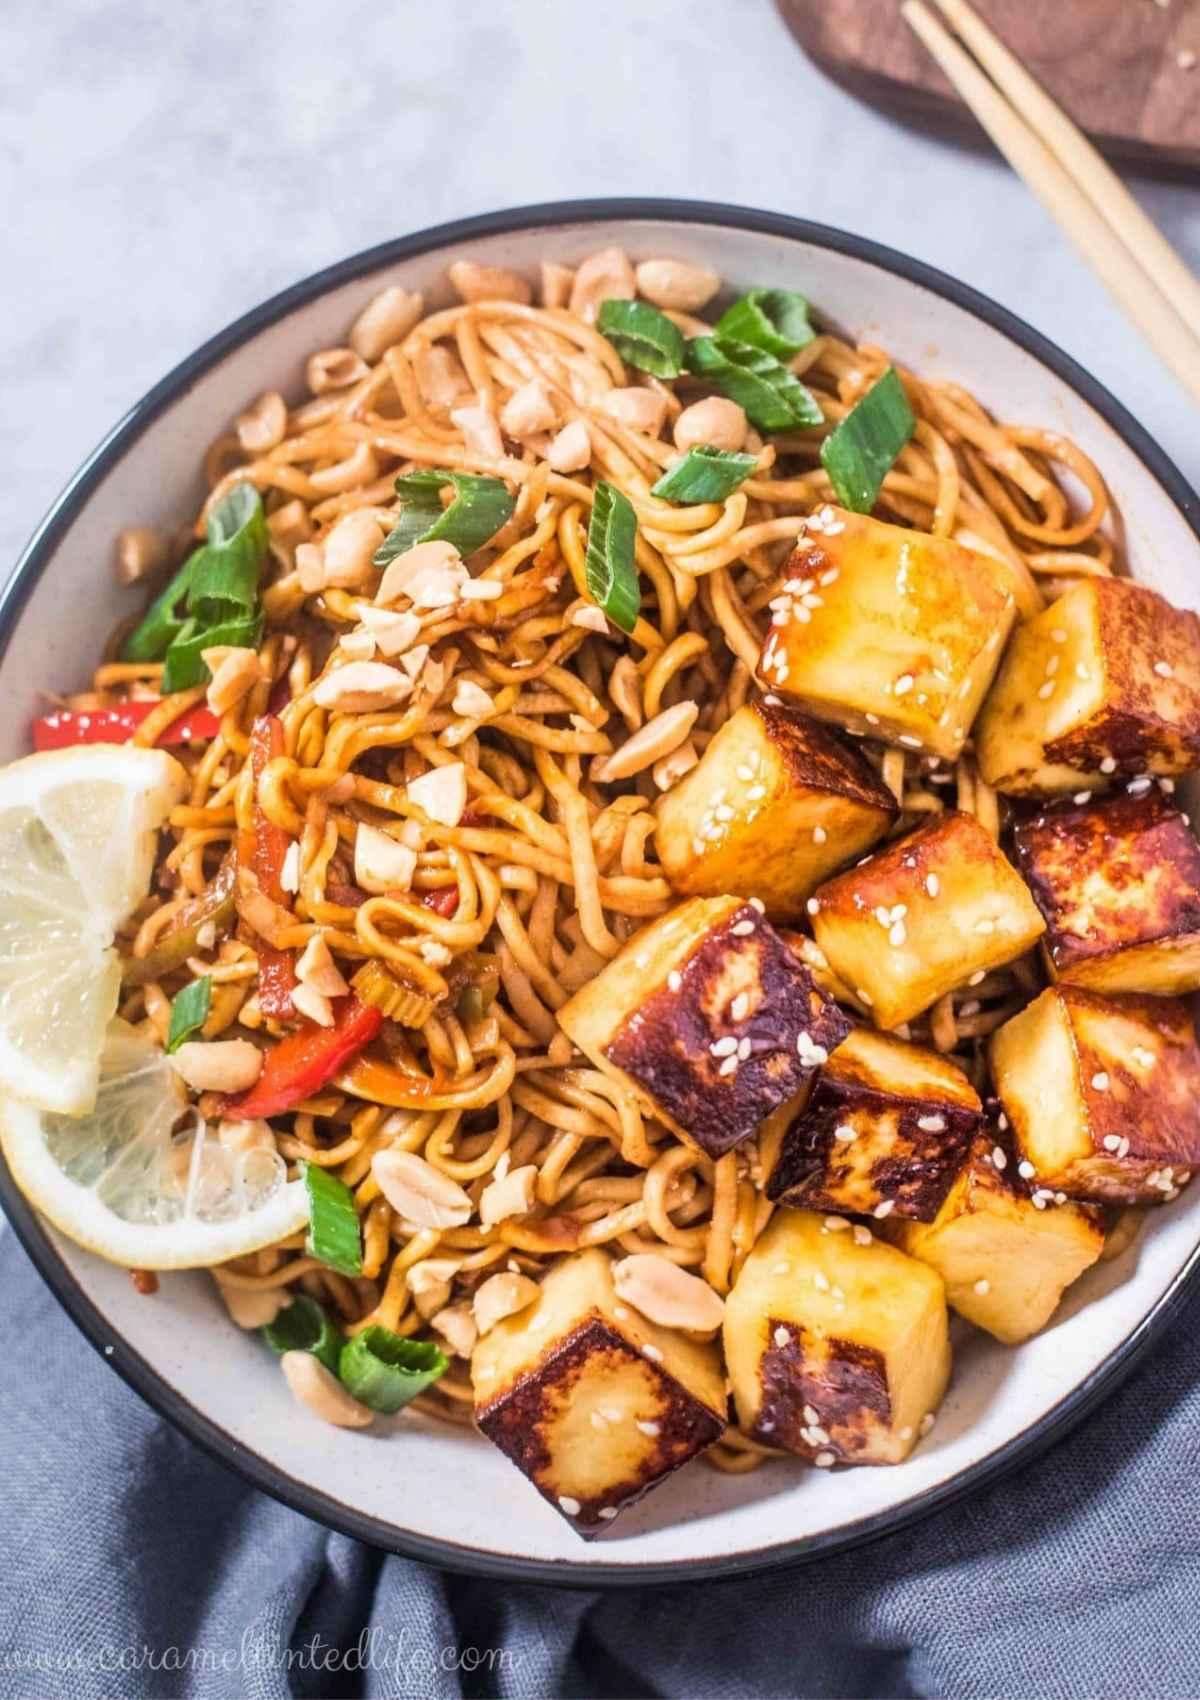 Noodle bowl with noodles, paneer, peanuts, stir-fried veggies